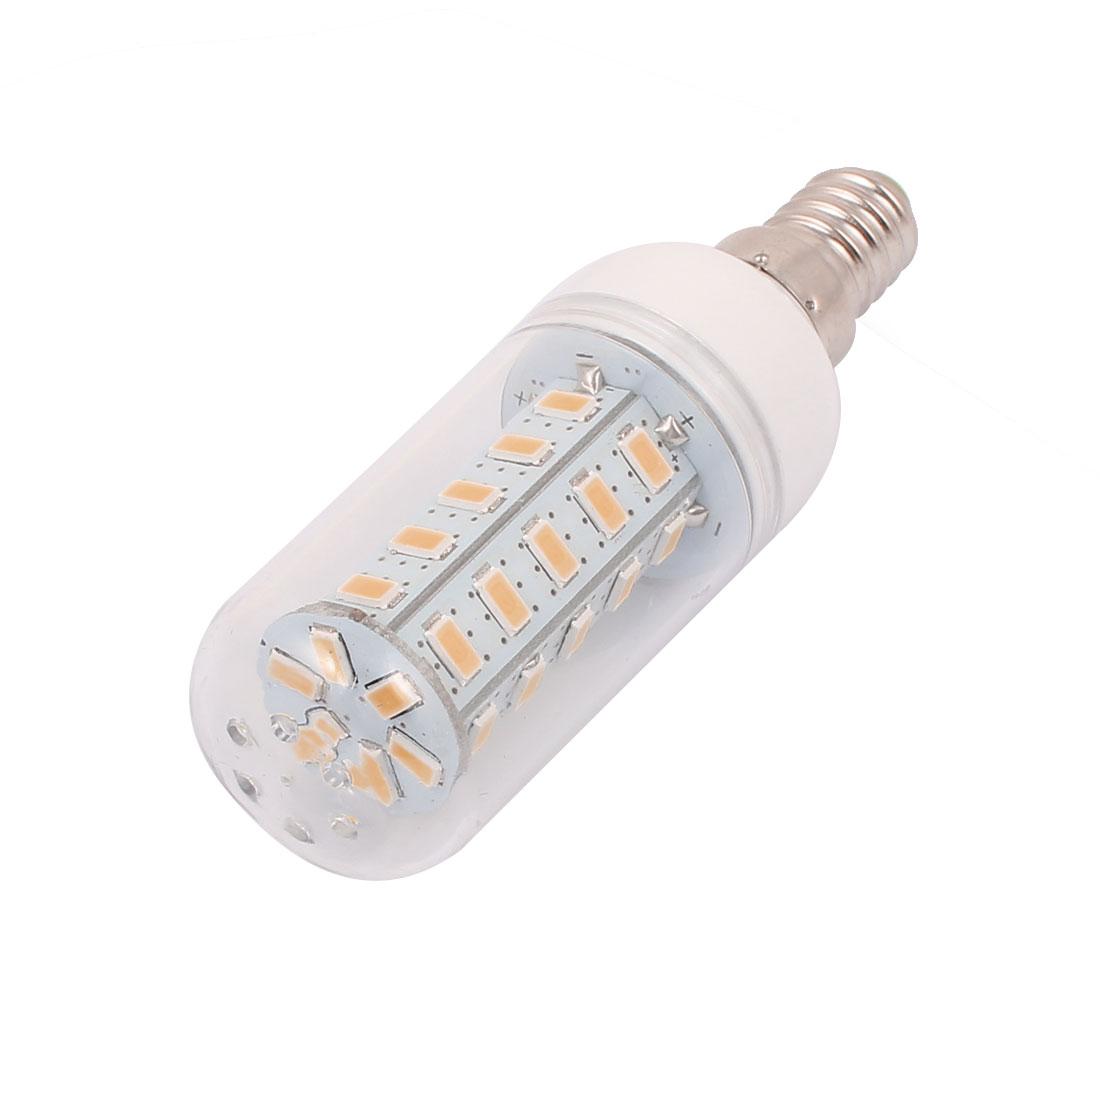 AC220-240V 5W 36 x 5730SMD E14 LED Corn Bulb Light Lamp Energy Saving Warm White